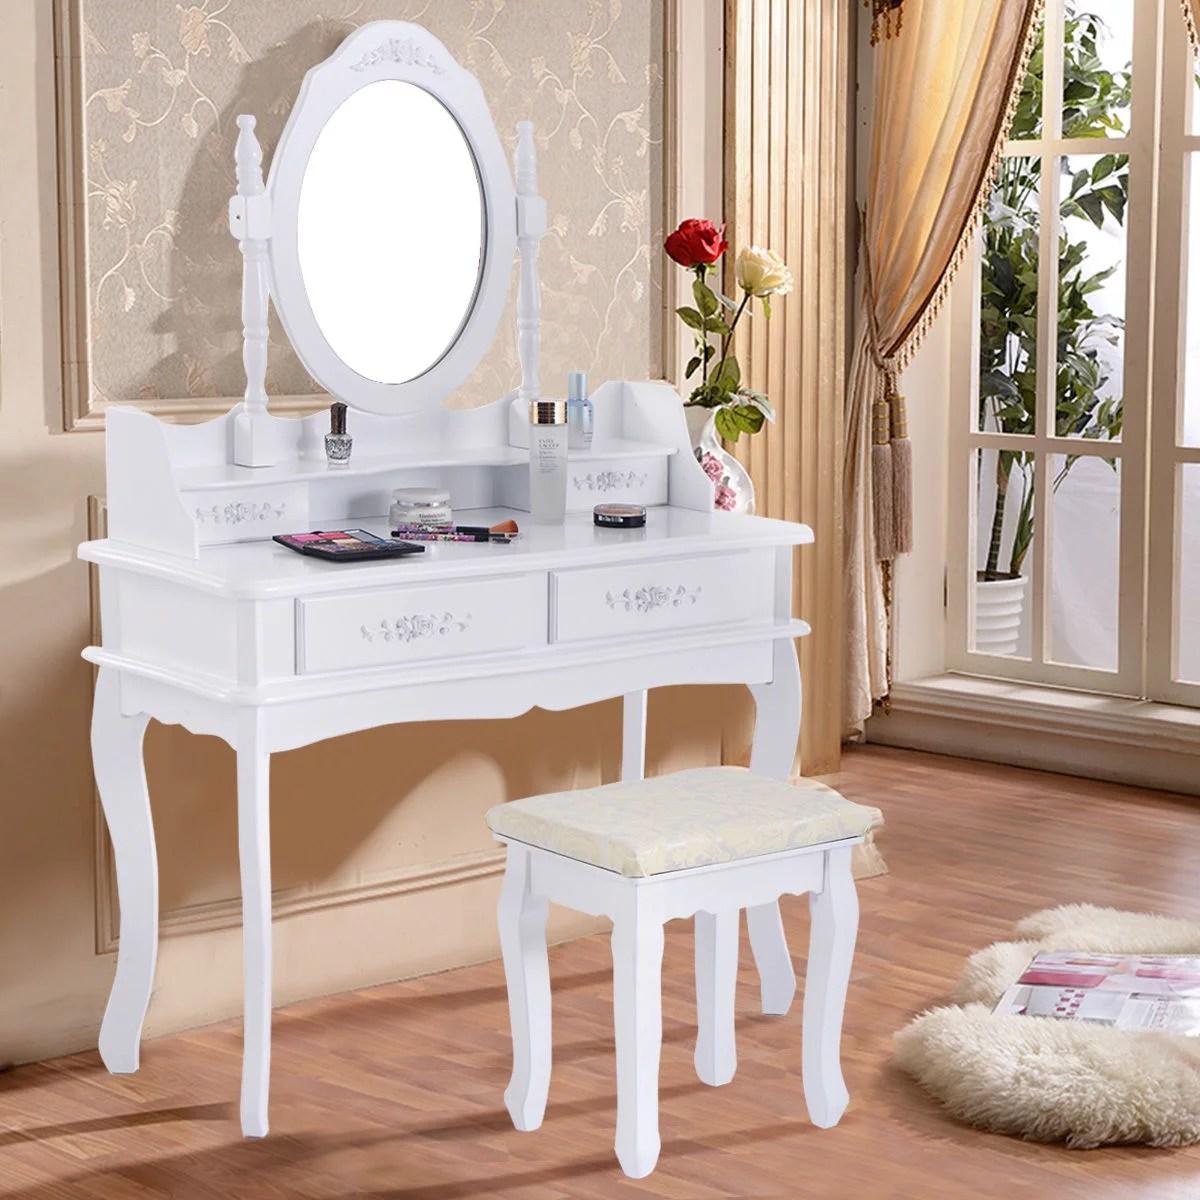 Costway White Vanity Jewelry Makeup Dressing Table Set